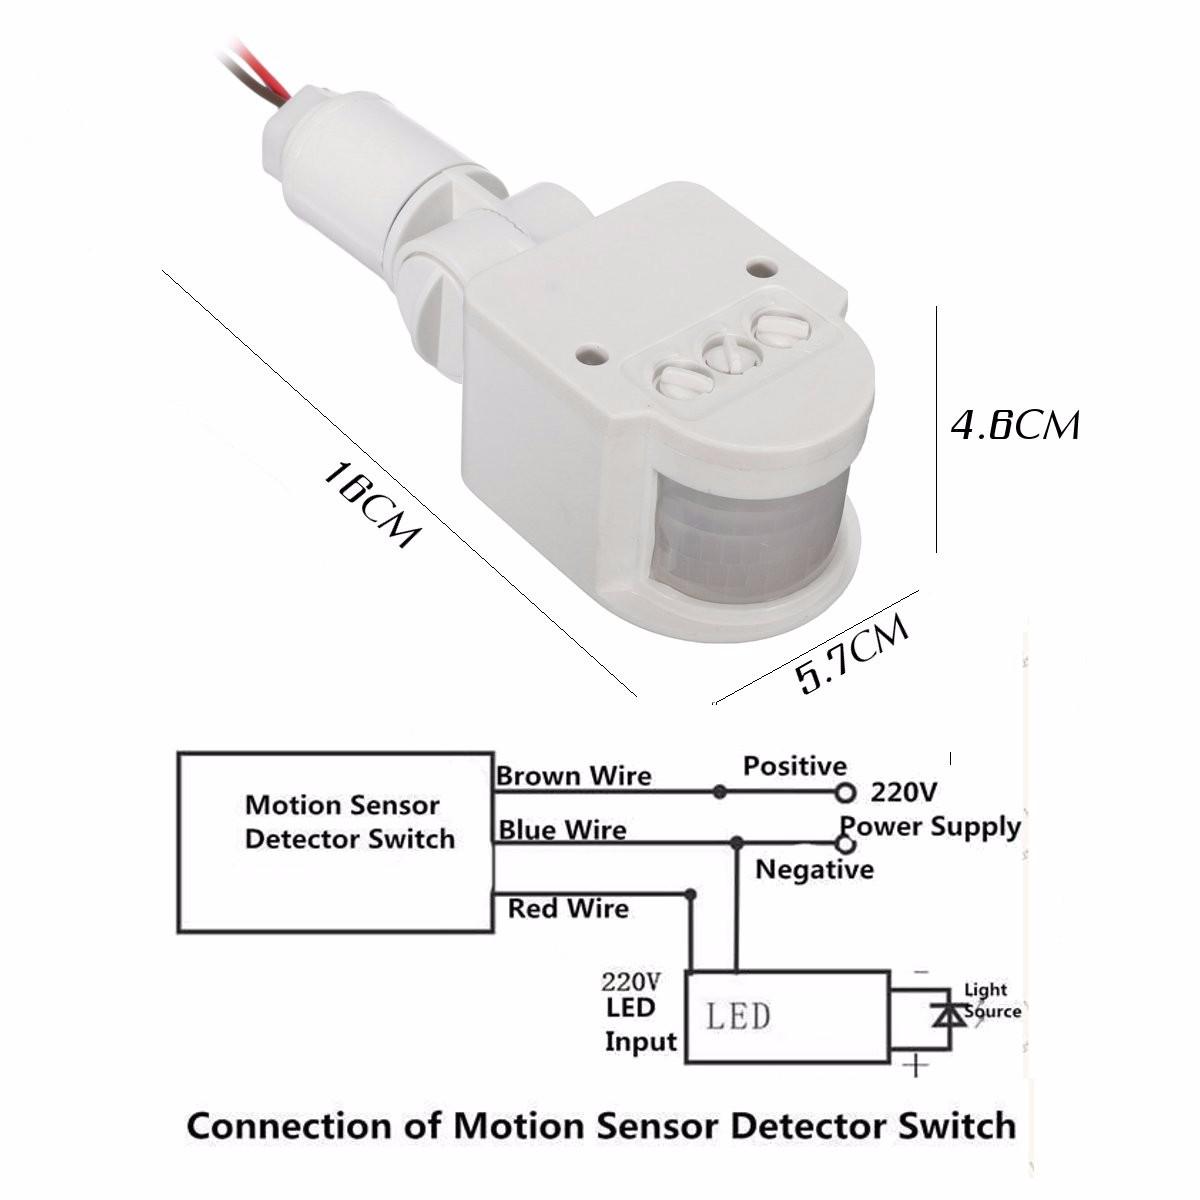 zenith motion sensor wiring diagram ne 4025  motion sensor wall light wiring diagram wiring diagram  motion sensor wall light wiring diagram